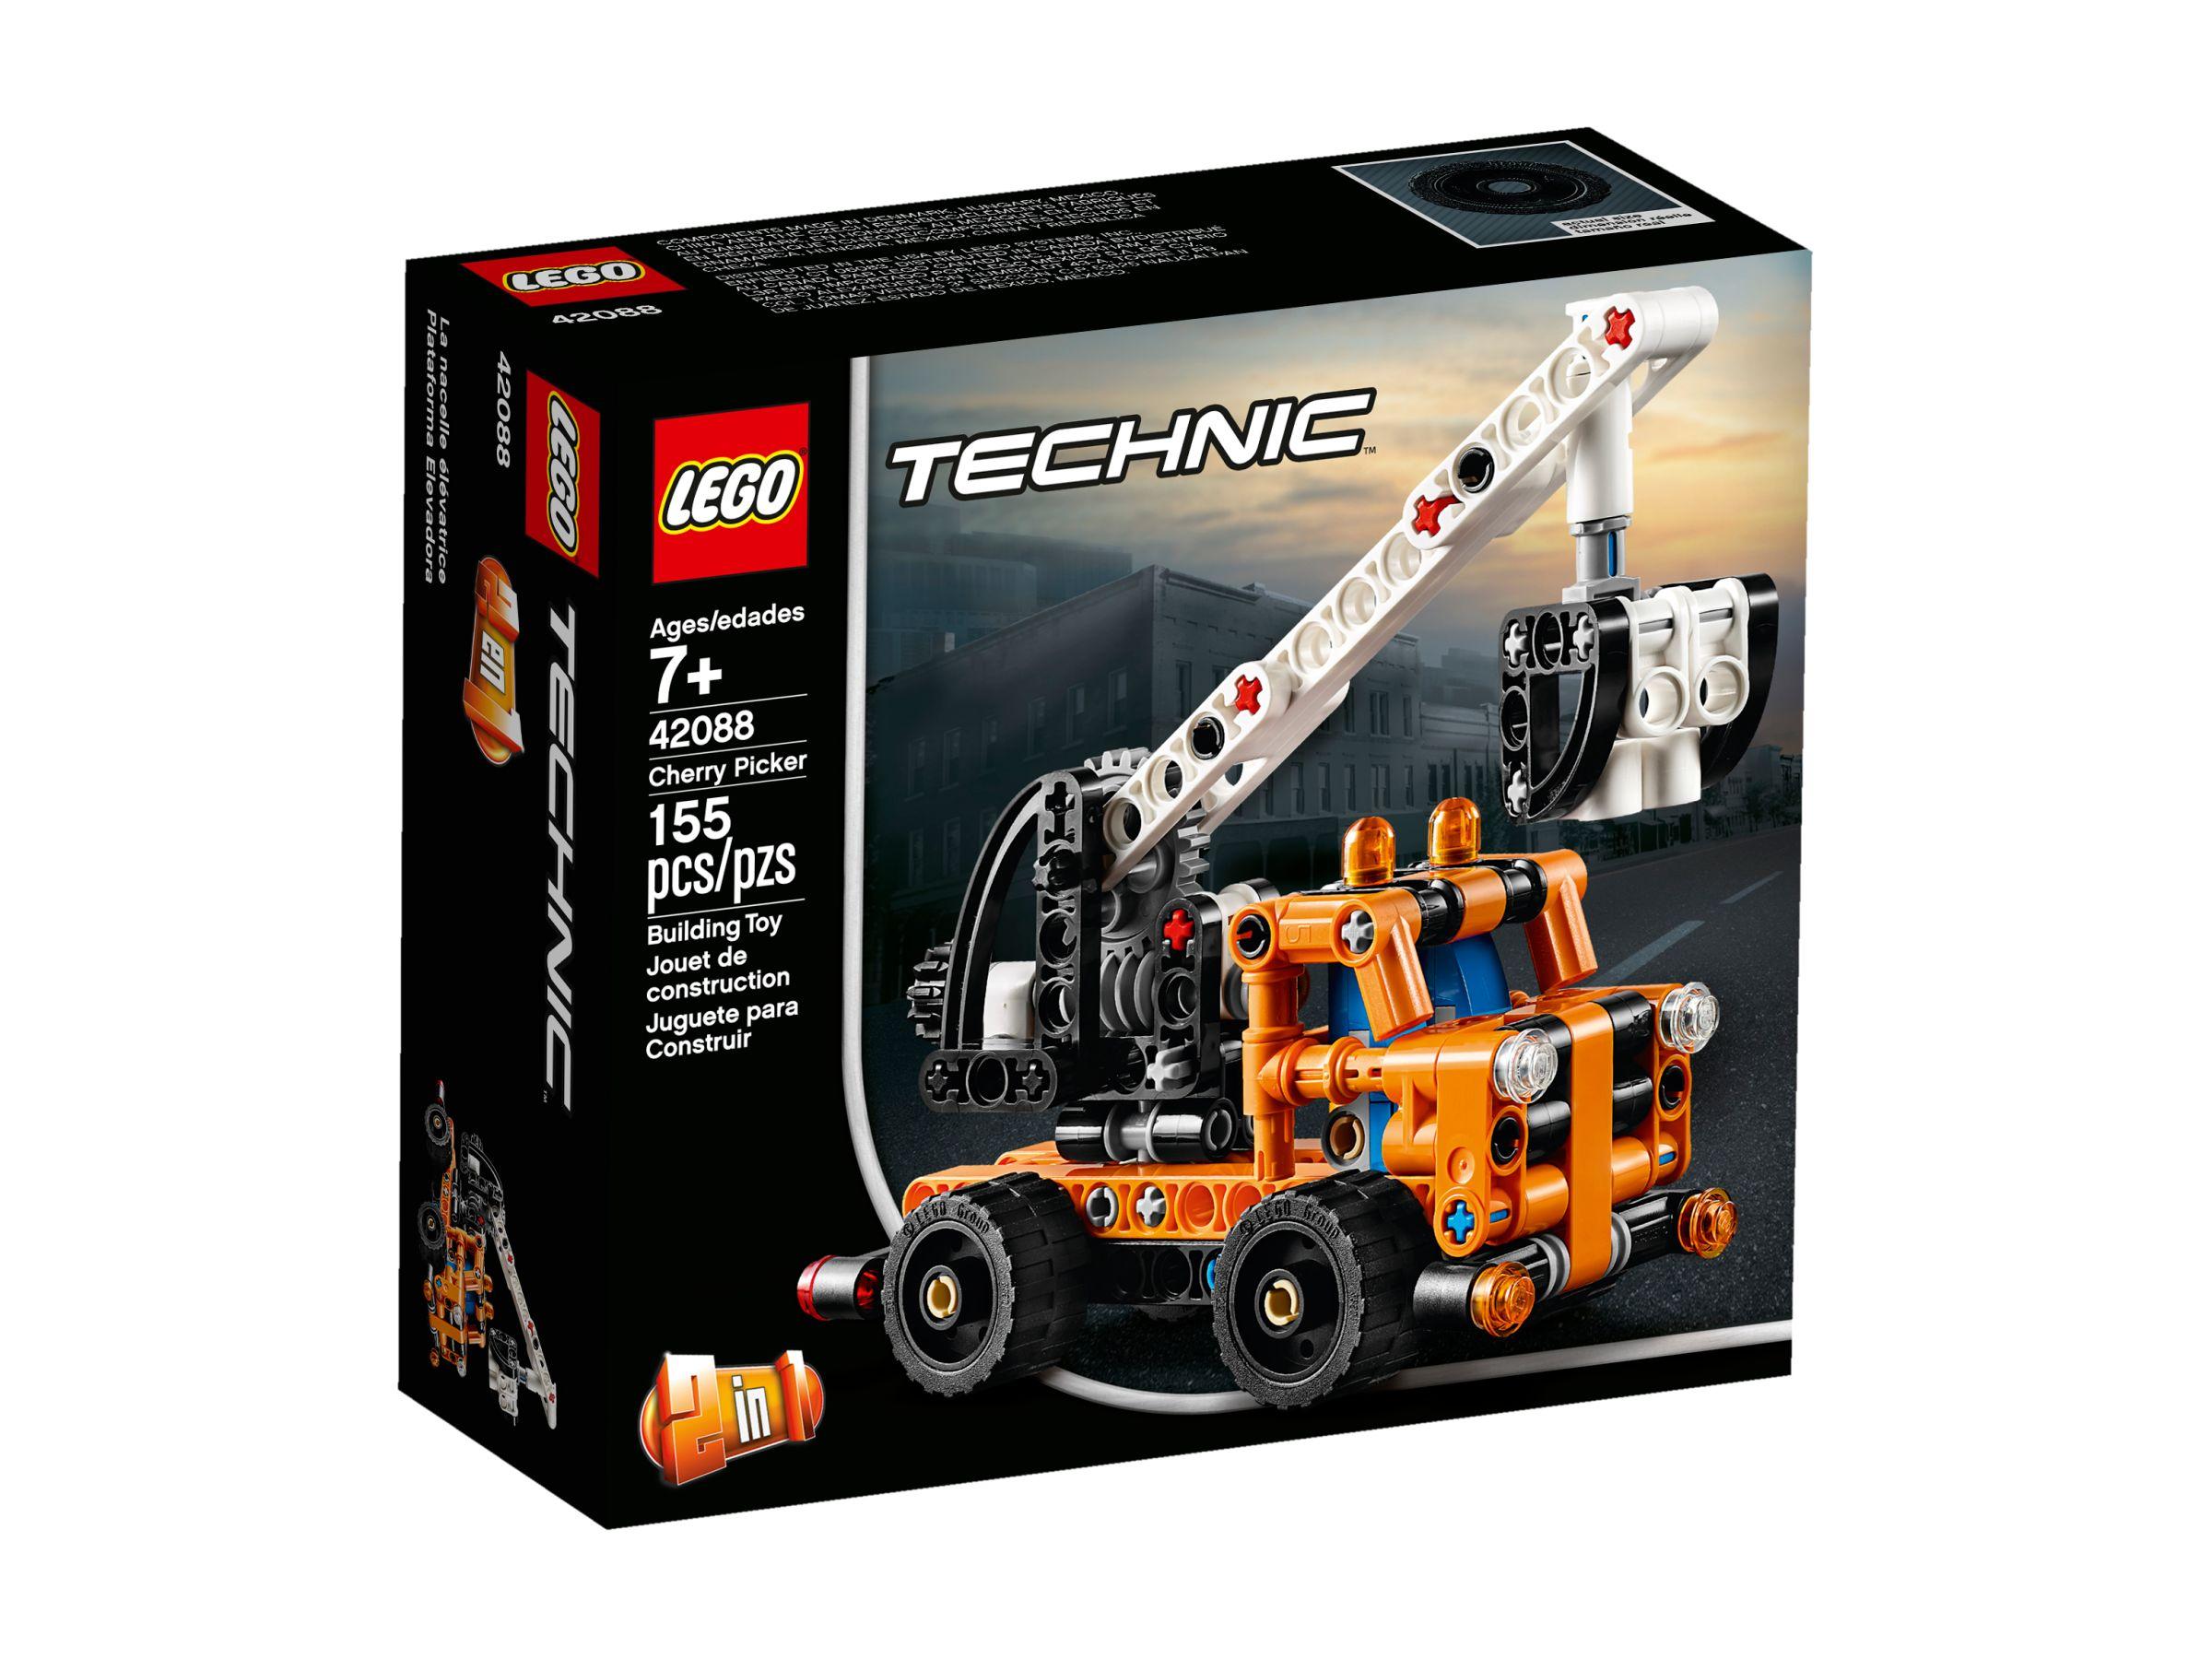 lego technic 42088 hubarbeitsb hne ab 6 97 30 gespart. Black Bedroom Furniture Sets. Home Design Ideas